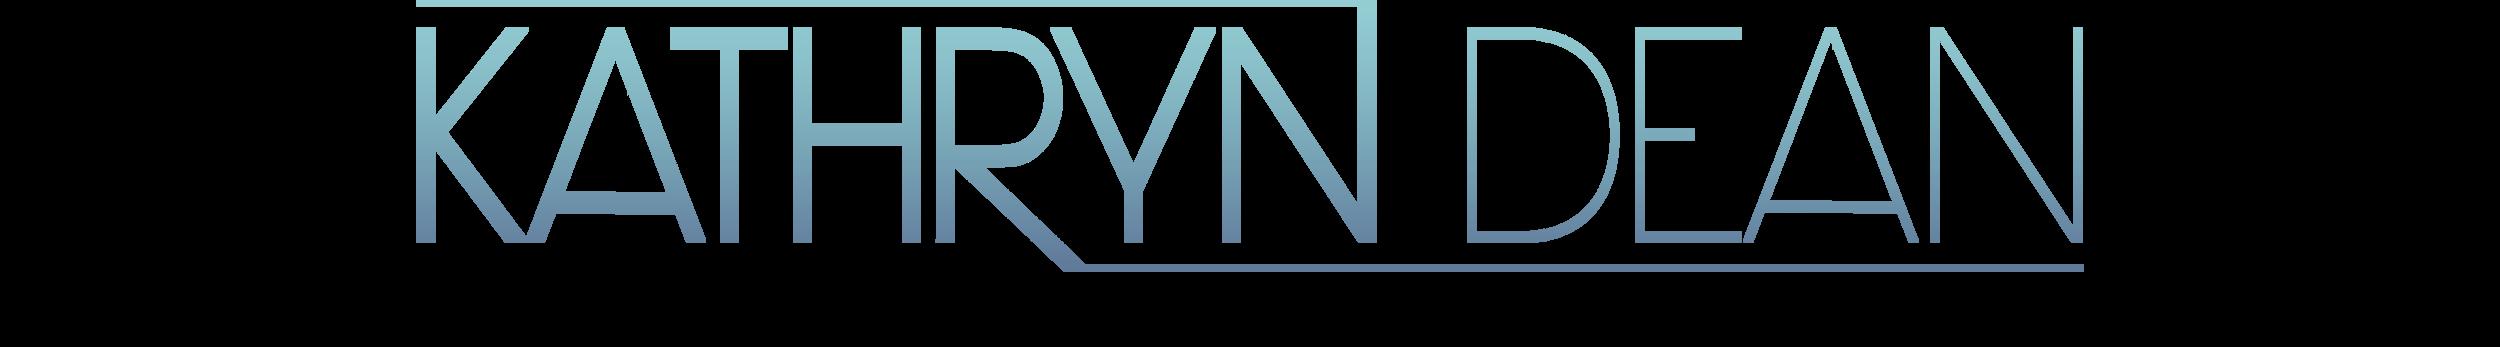 Kathryn Dean Logo.png